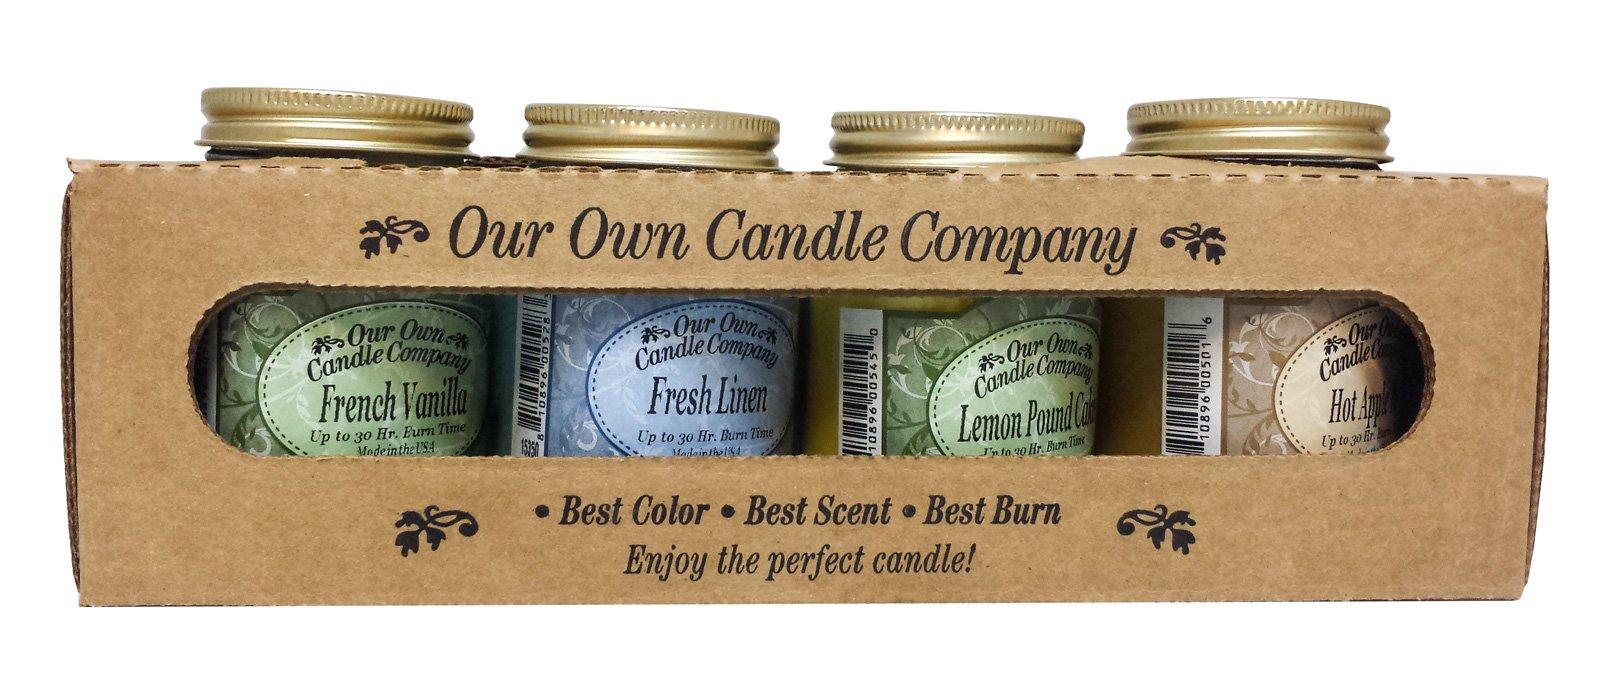 Our Own Candle Company 4 Pack Everyday Assortment Mini Mason Jar Candles - 3.5 oz French Vanilla, 3.5 oz Fresh Linen, 3.5 oz Lemon Poundcake, 3.5 oz Hot Apple Pie